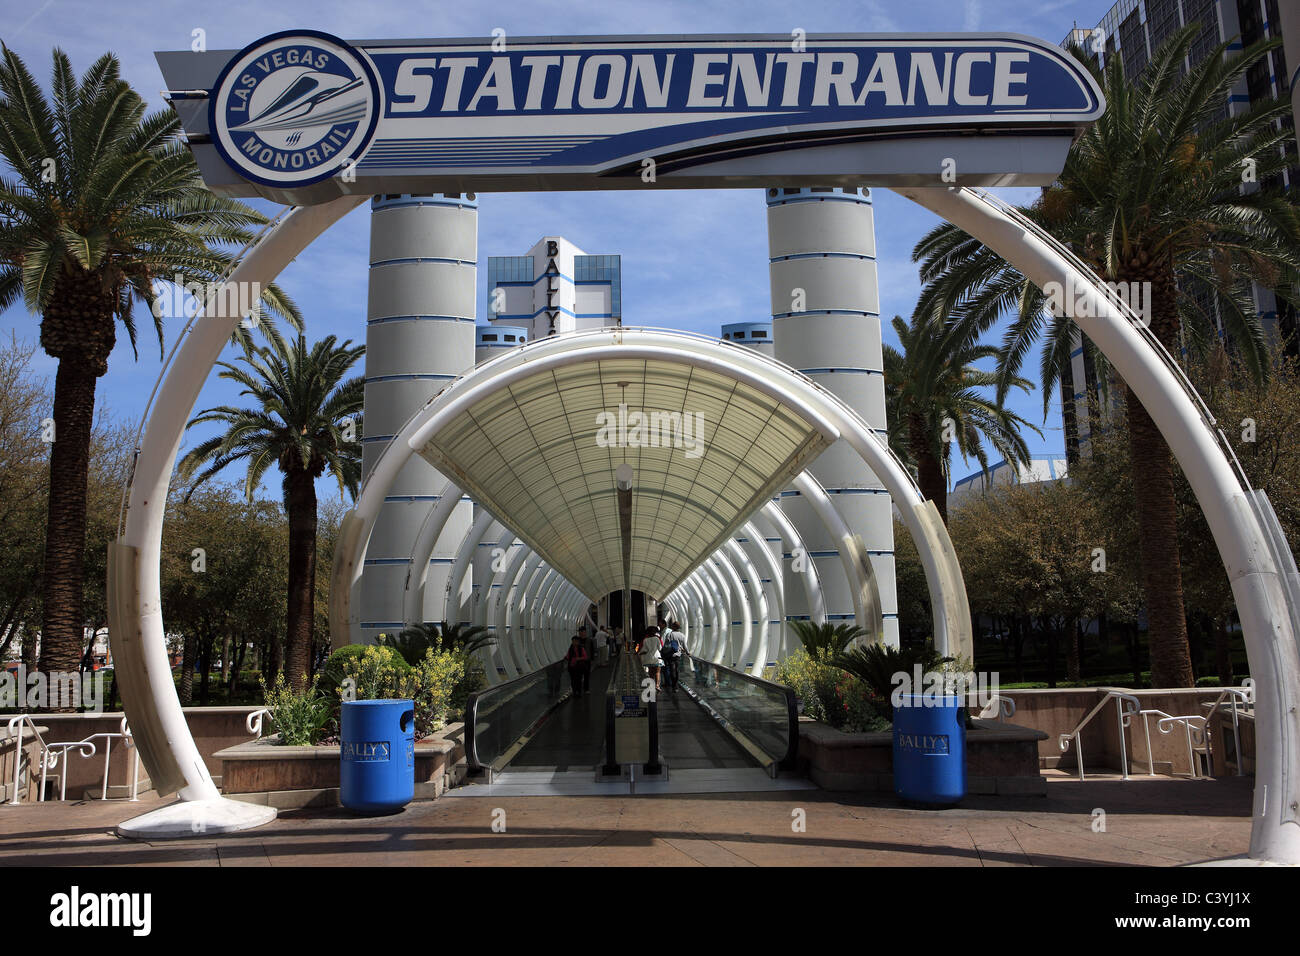 Las Vegas Monorail - Wikipedia